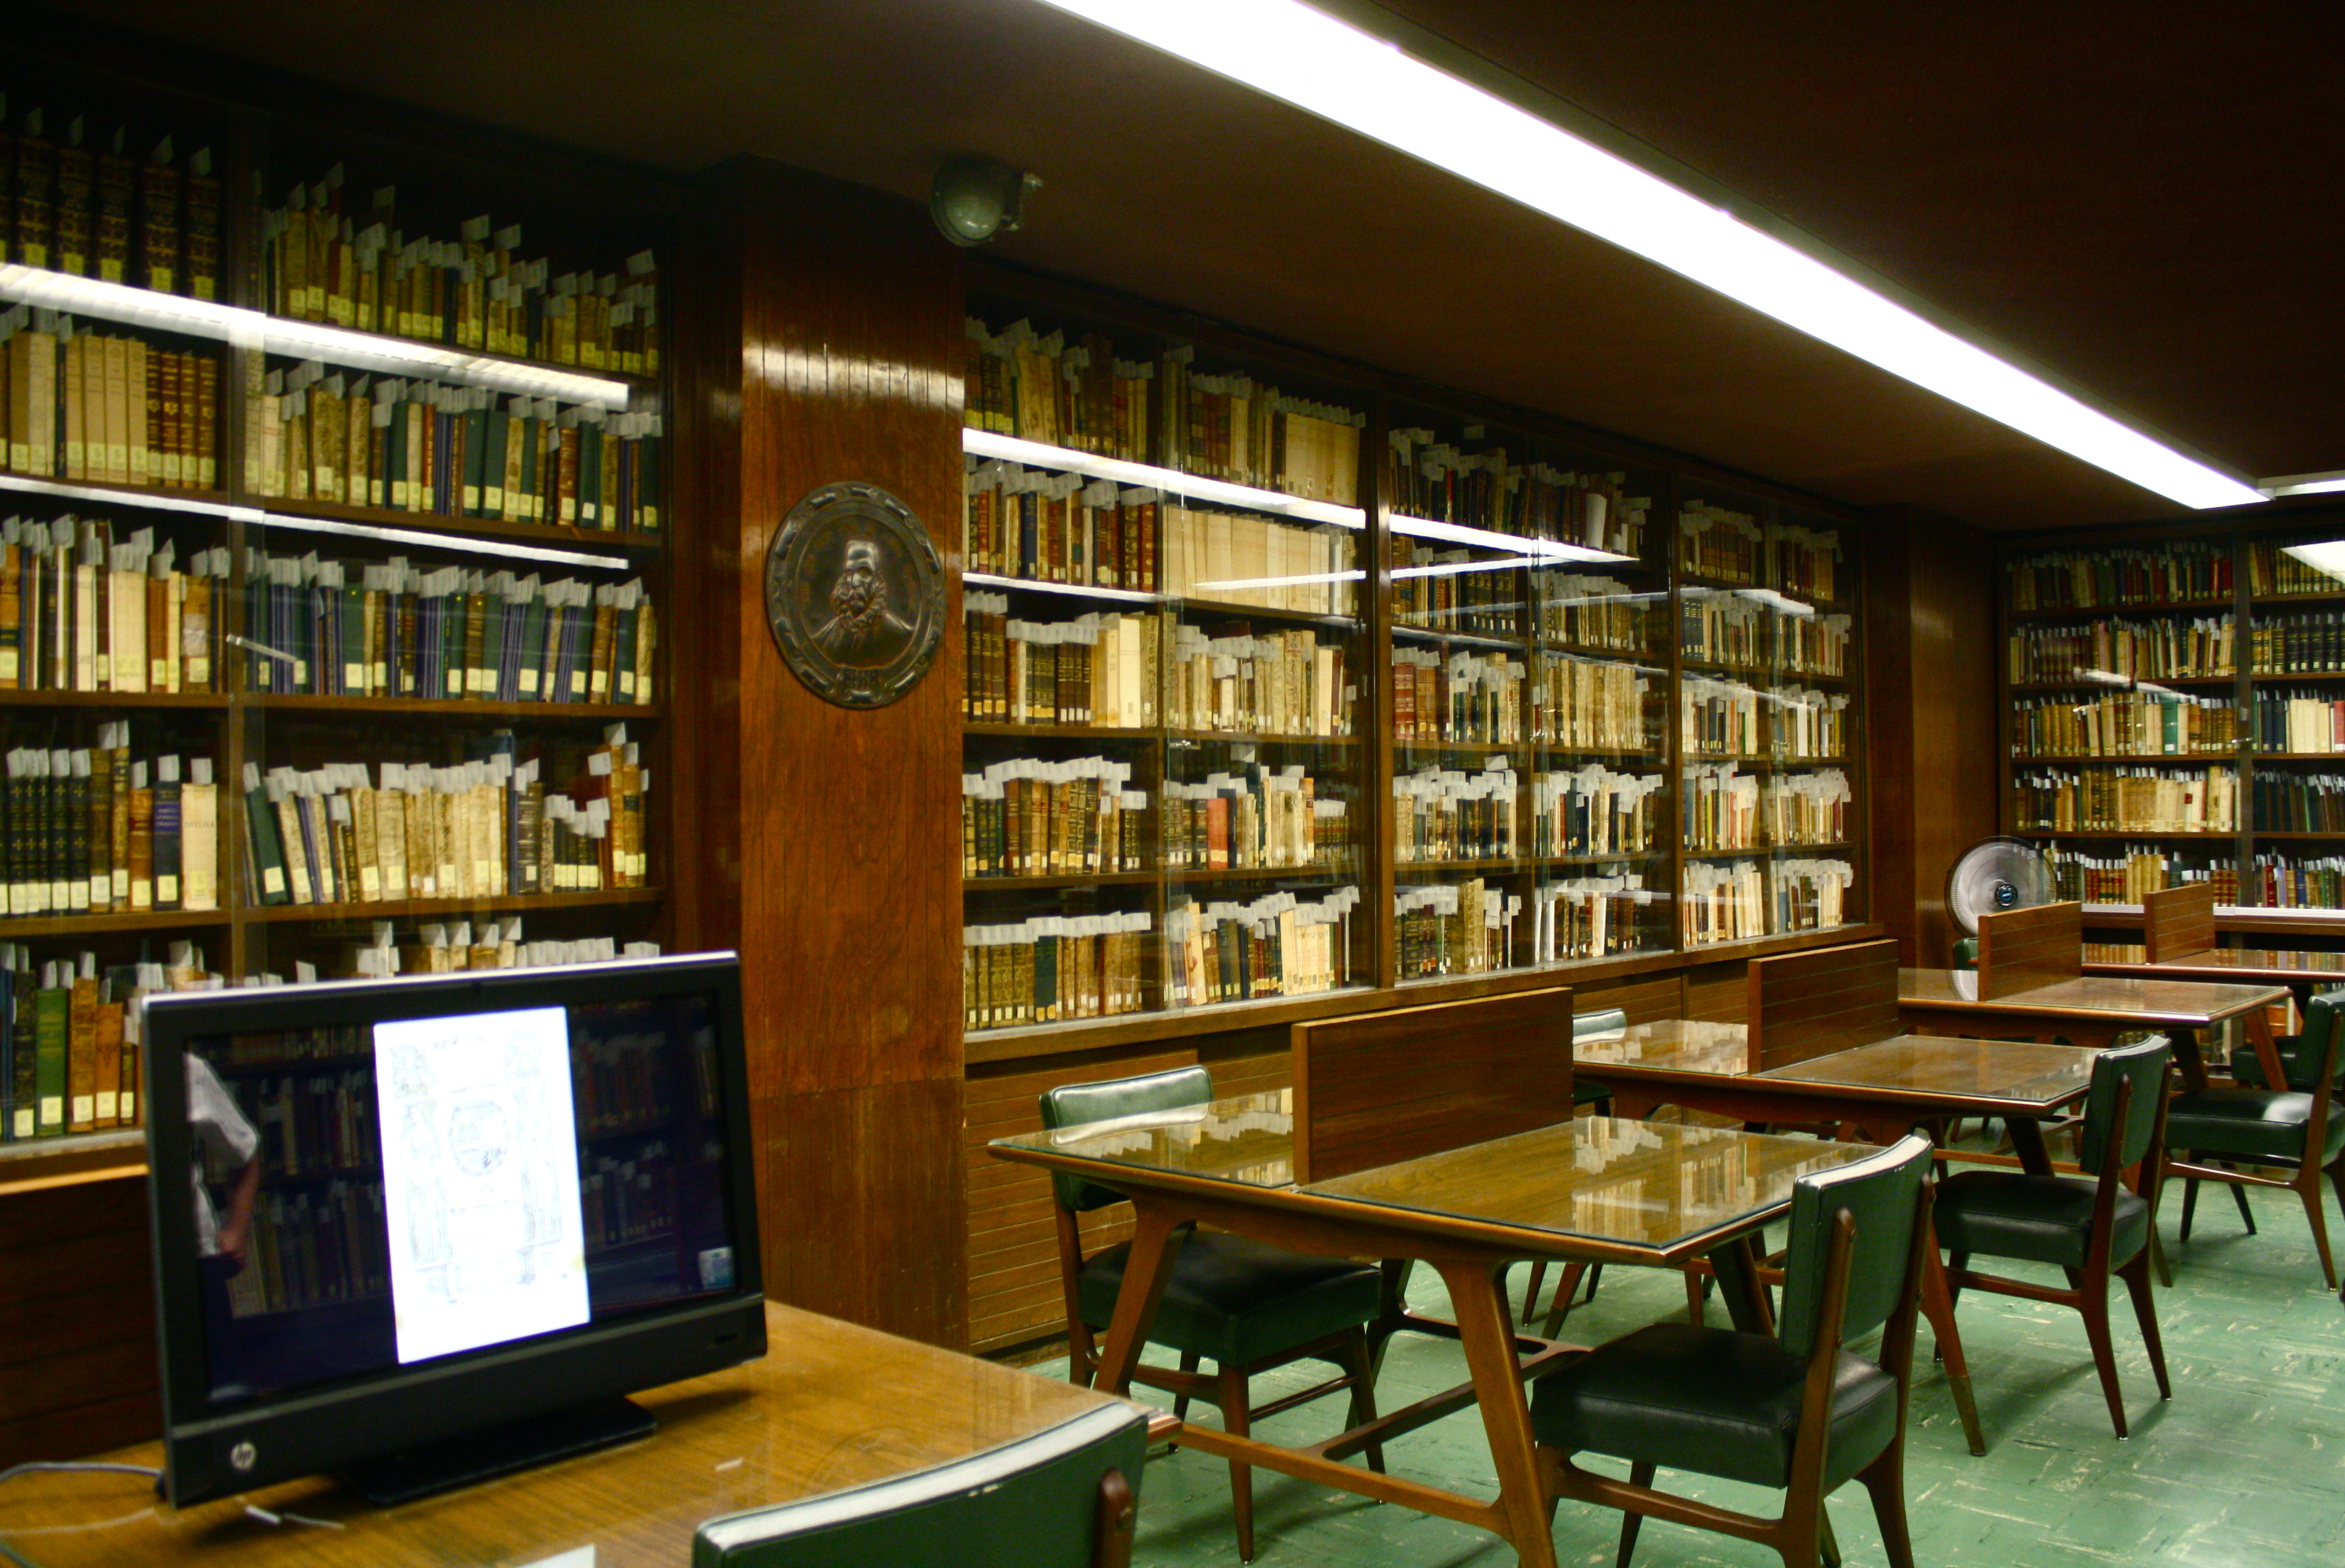 literatura espiritista | Grupo Espírita de La Palma